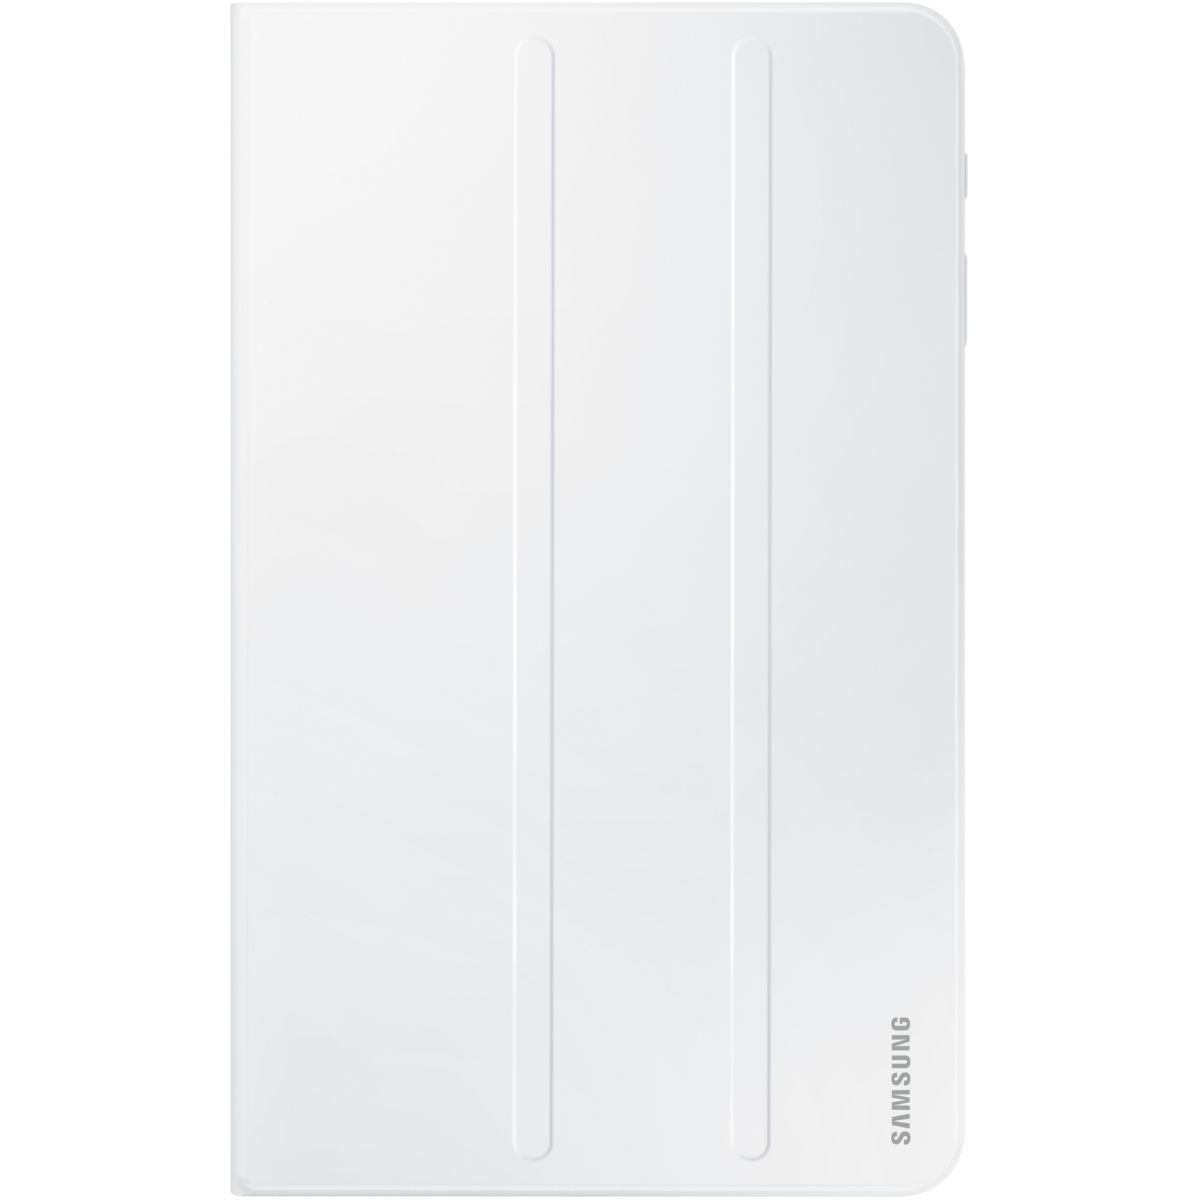 Etui tablette samsung book cover tab a 6 10'' blanc - livraison offerte : code liv (photo)